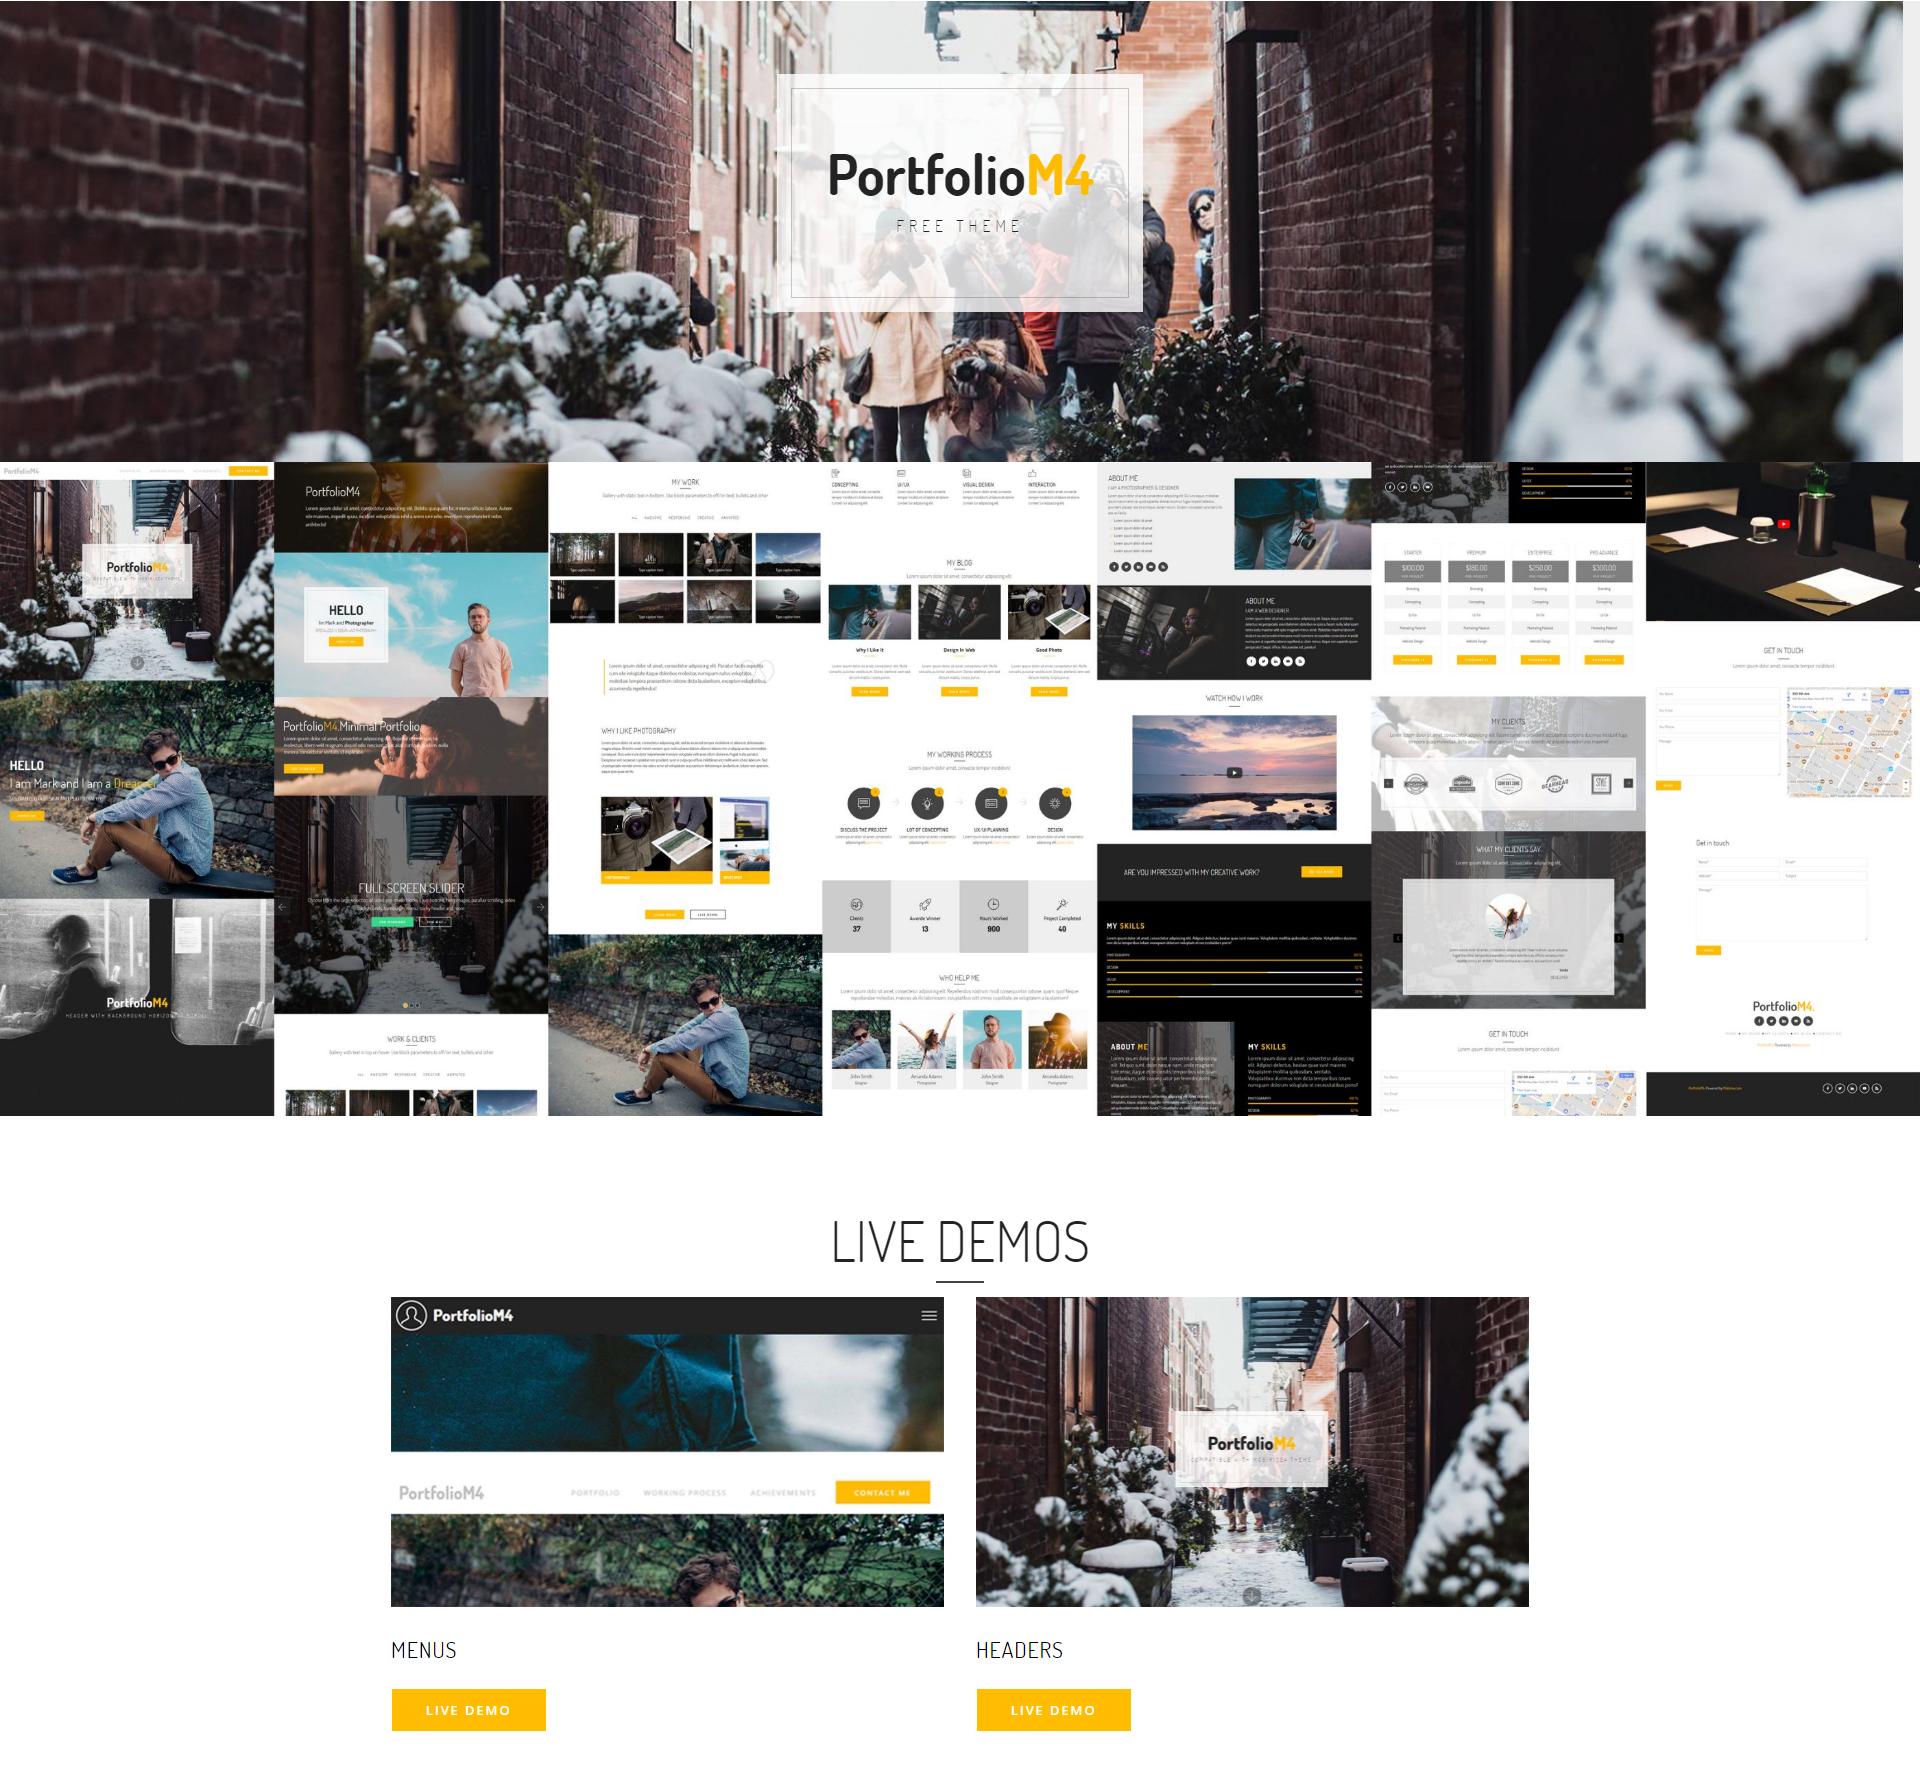 PortfolioM4 Free Bootstrap Theme